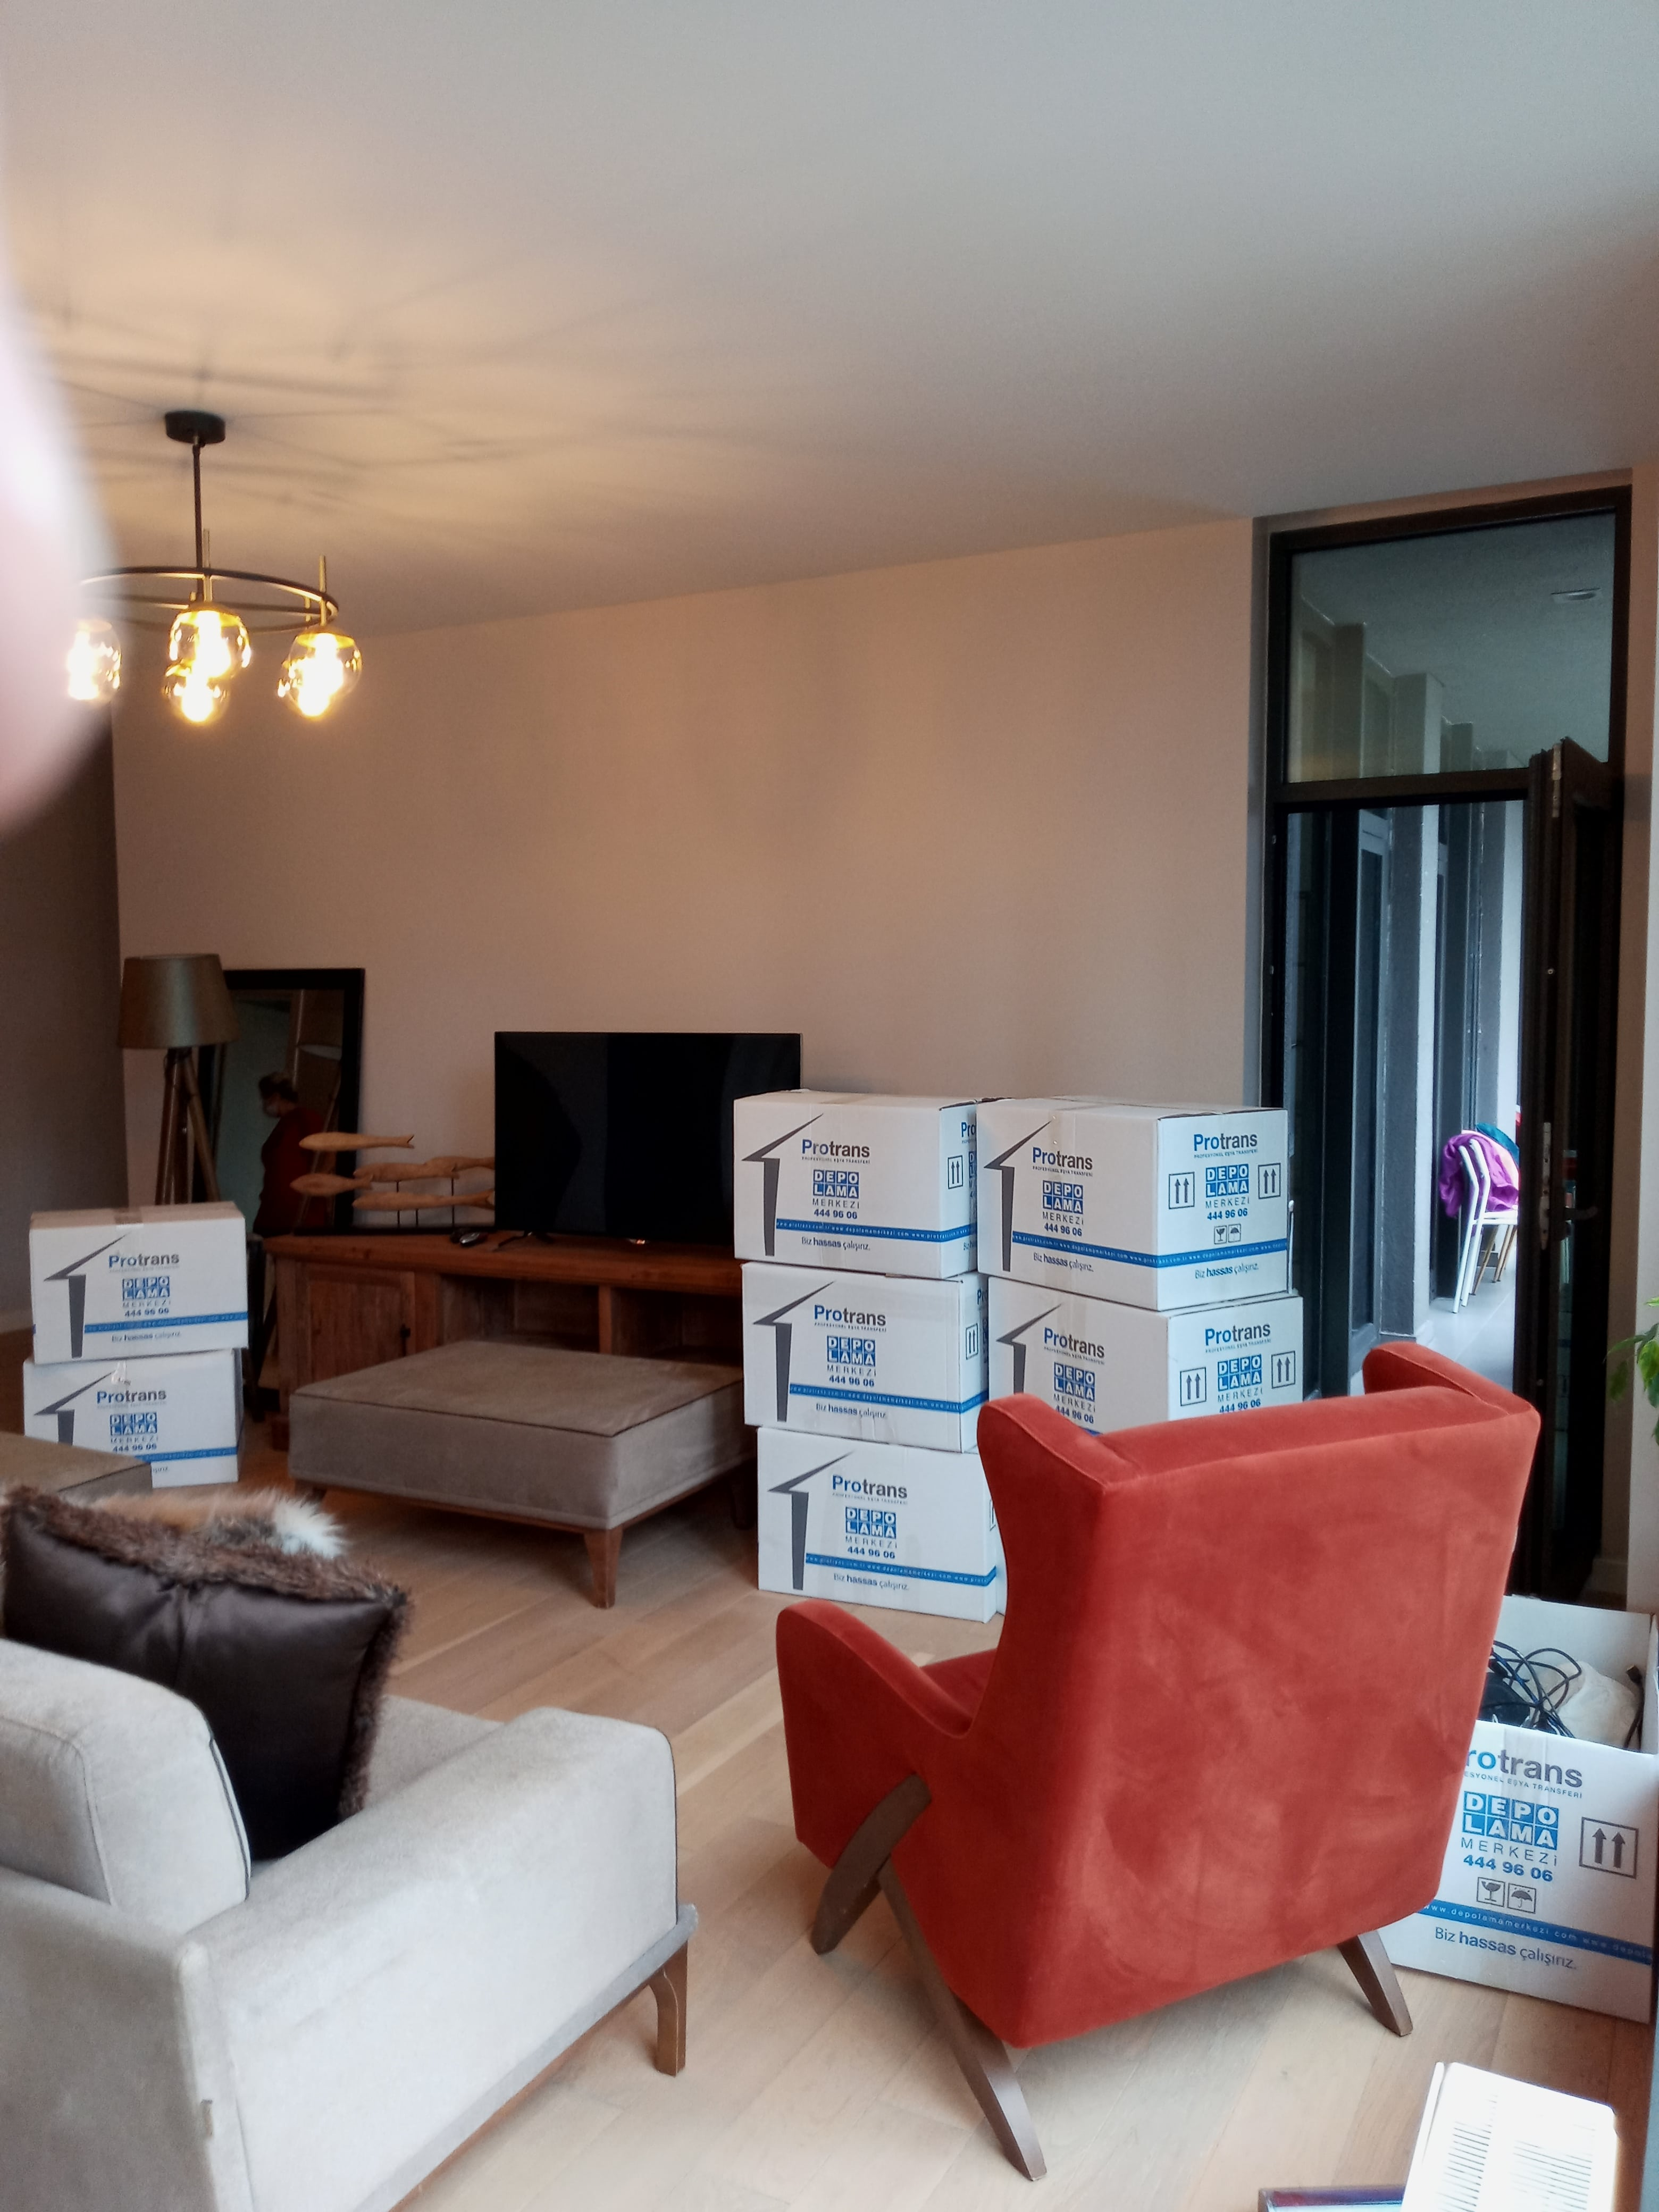 Paketleme Ambalajlama ve Eşya Transferi